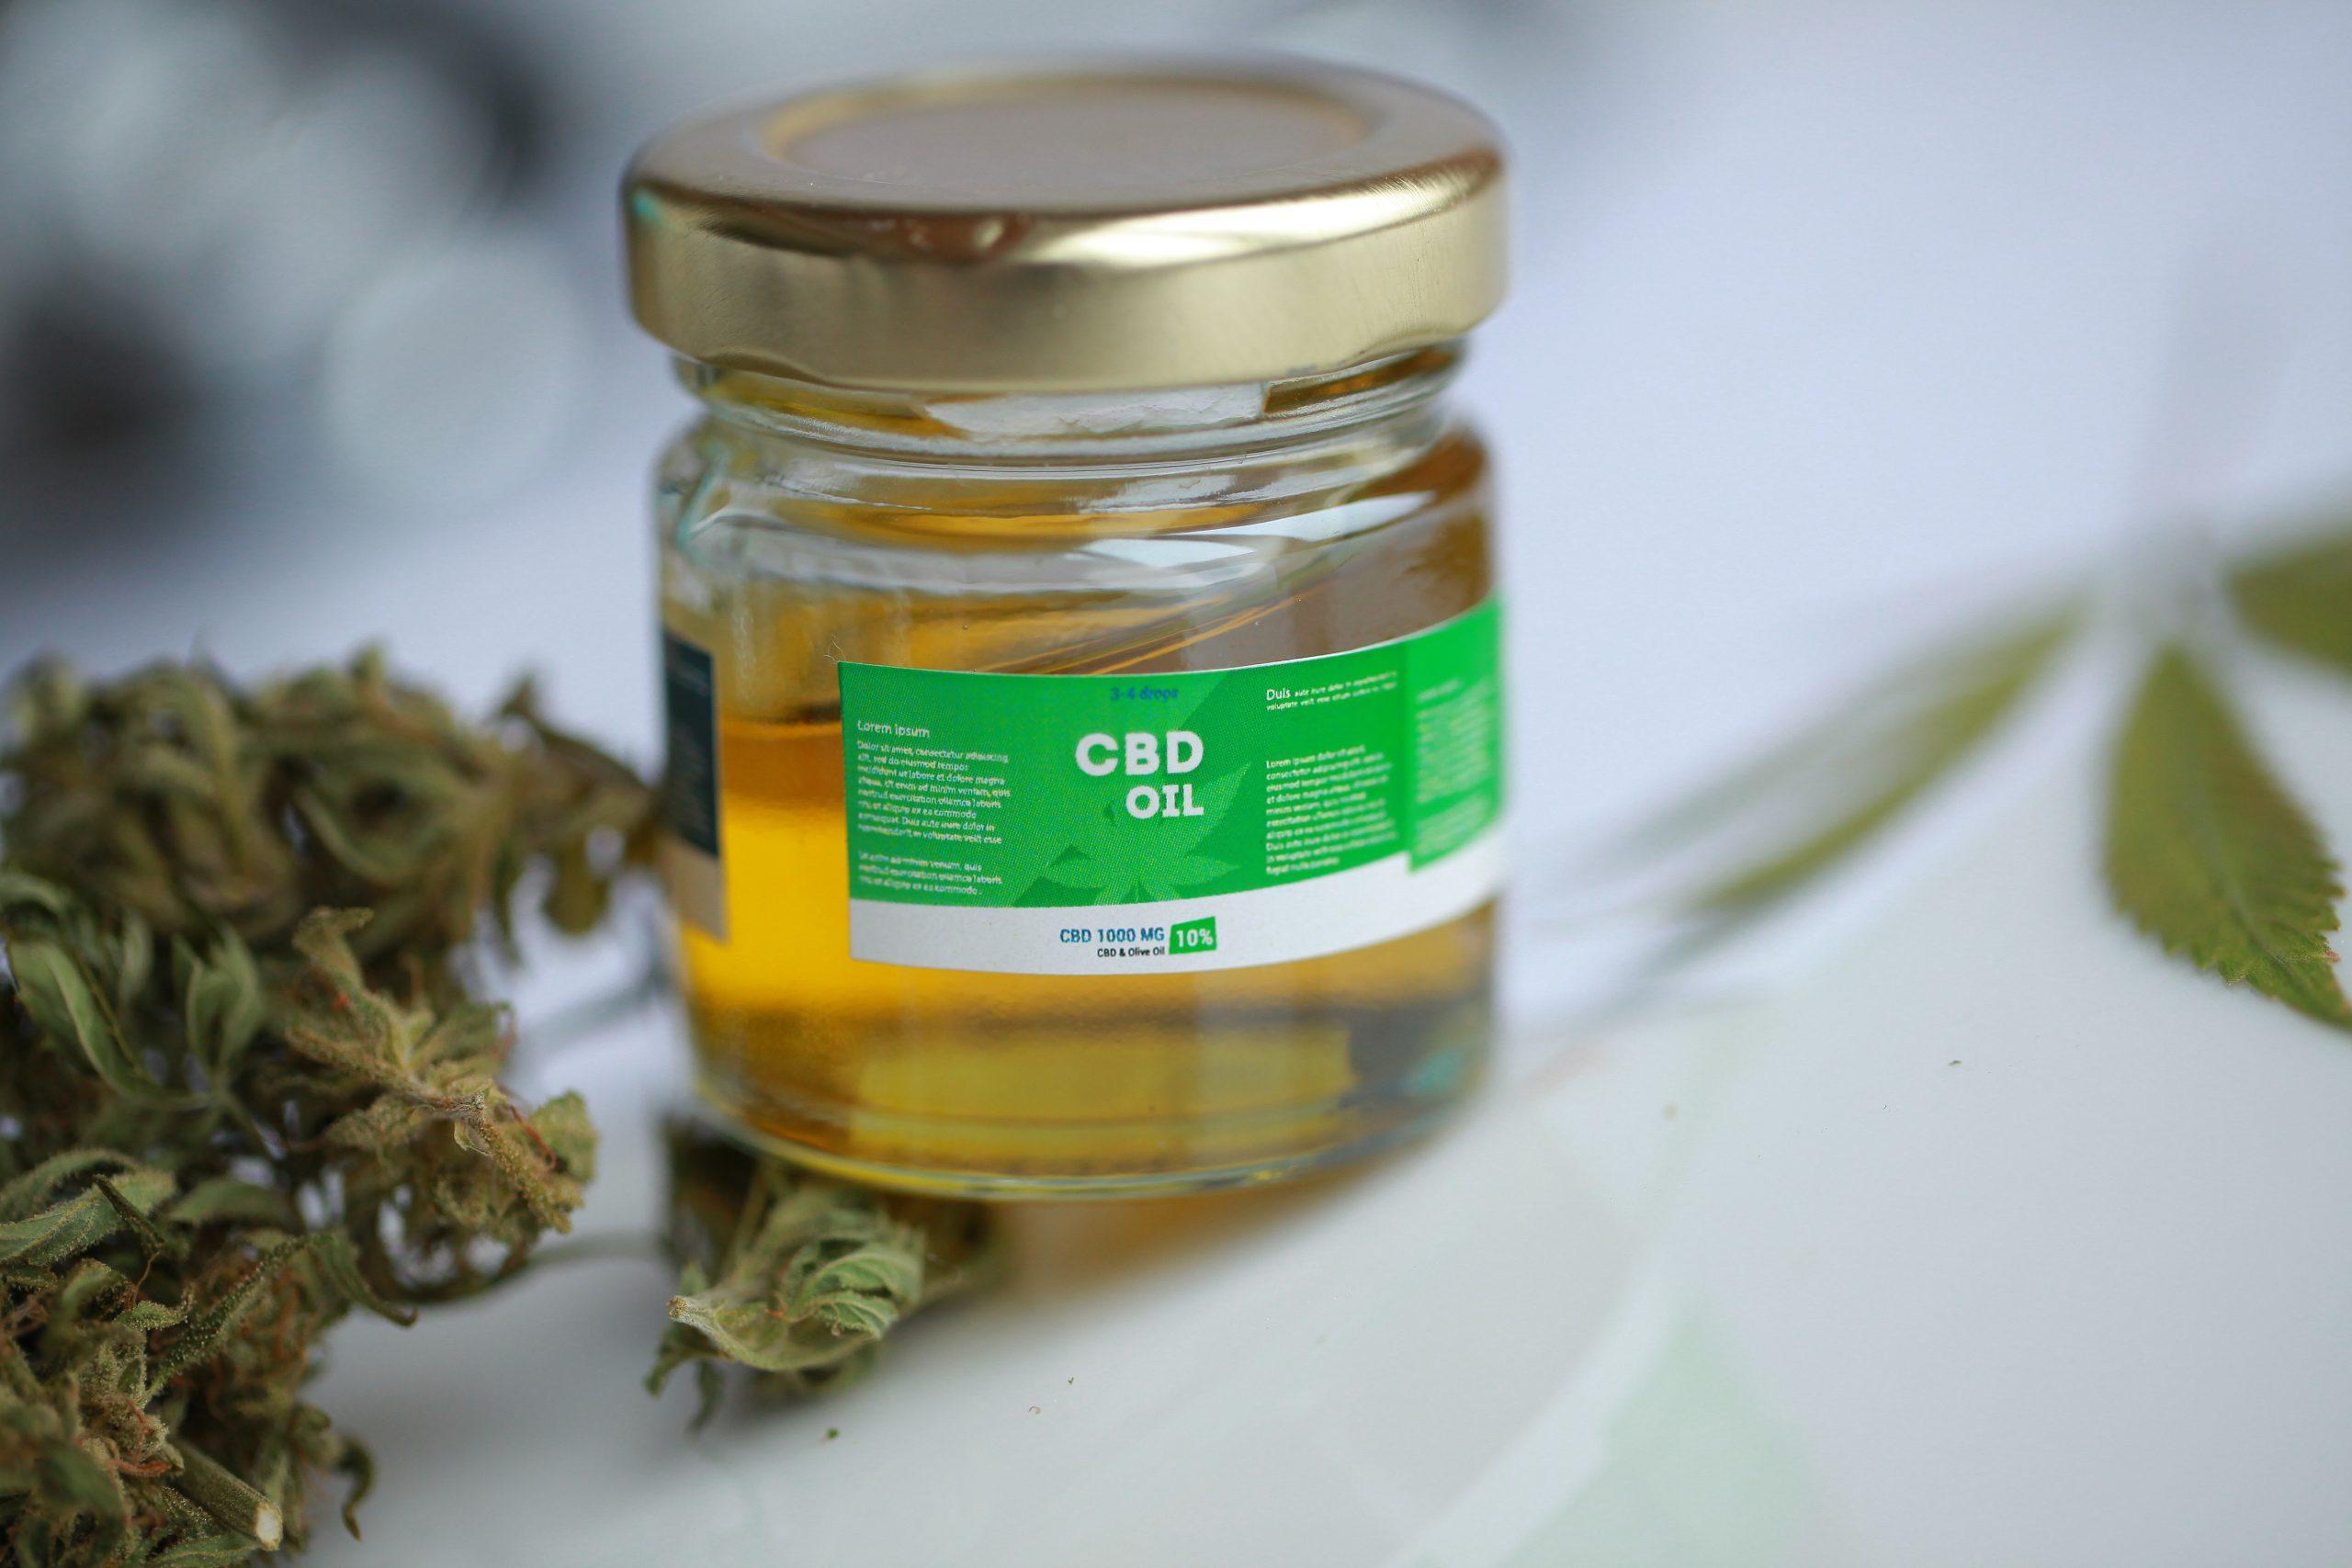 CBD Öl 10%: Test, Wirkung, Anwendung & Studien (08/20)